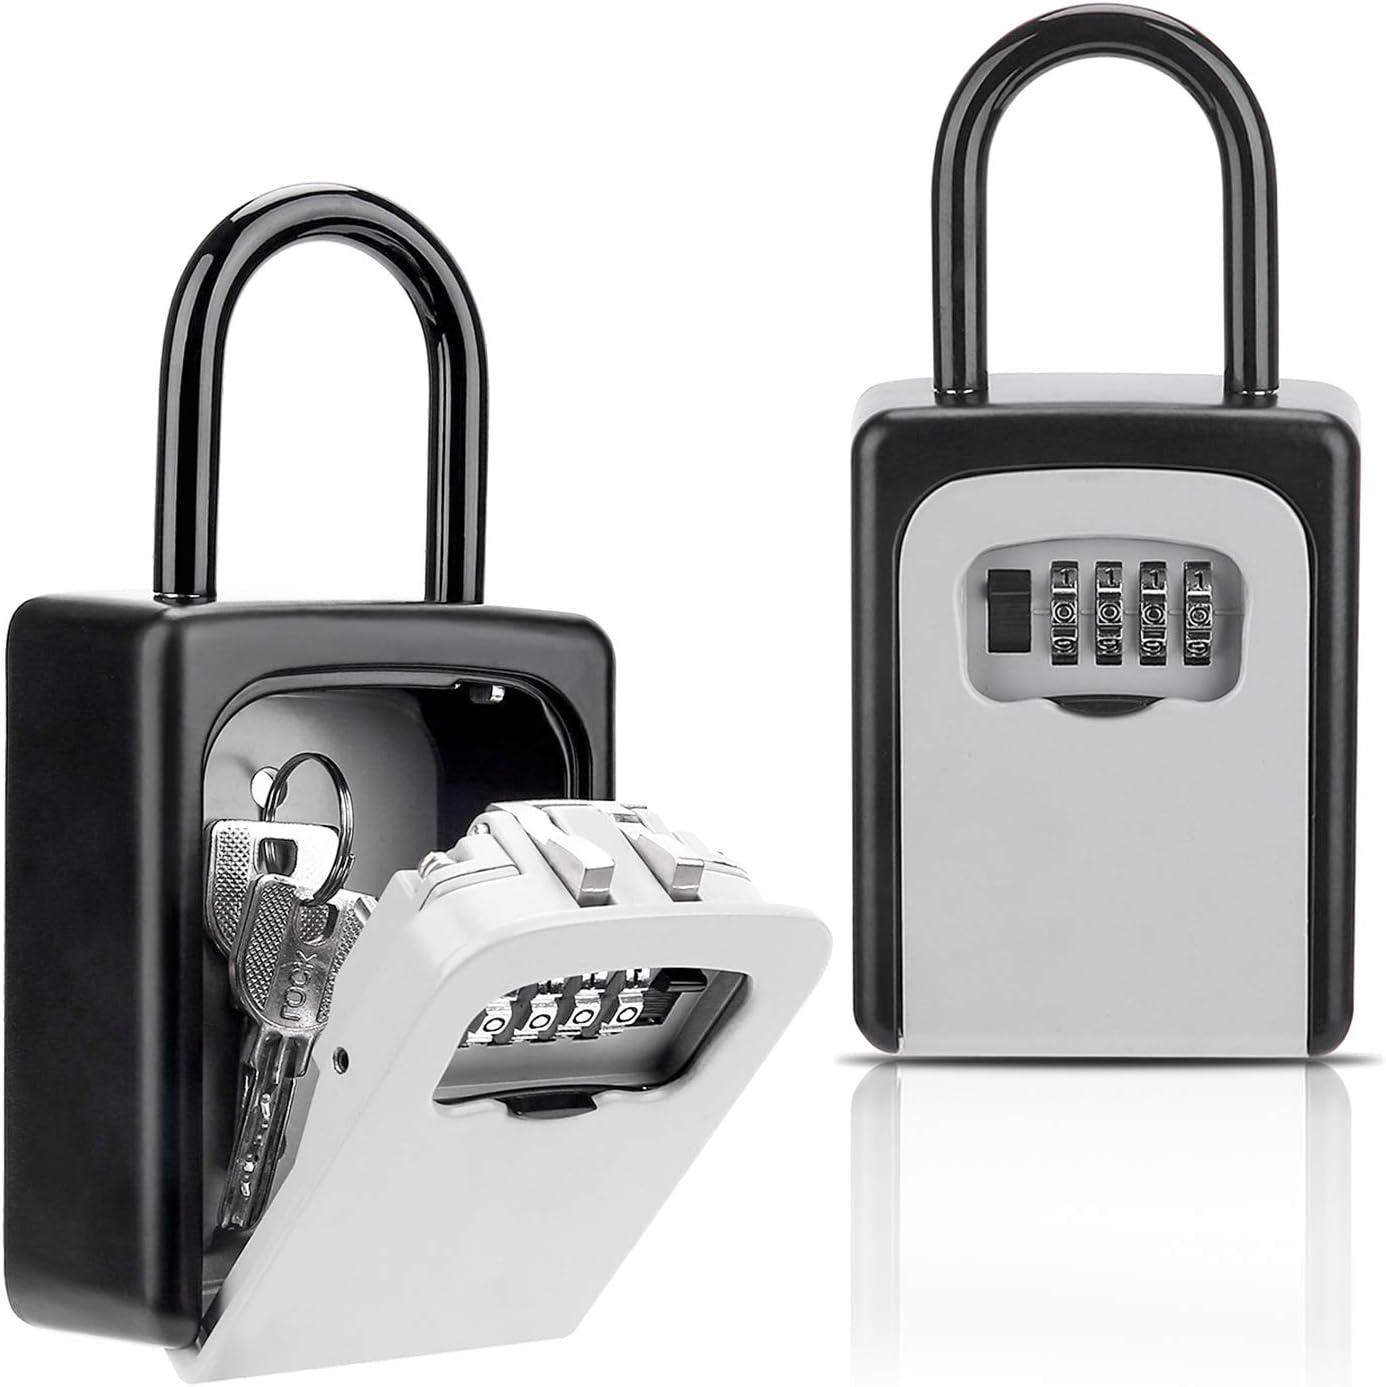 Amazon.com: Key Lock Box, Combination Lockbox with Code for House Key  Storage, Combo Door Locker: Electronics